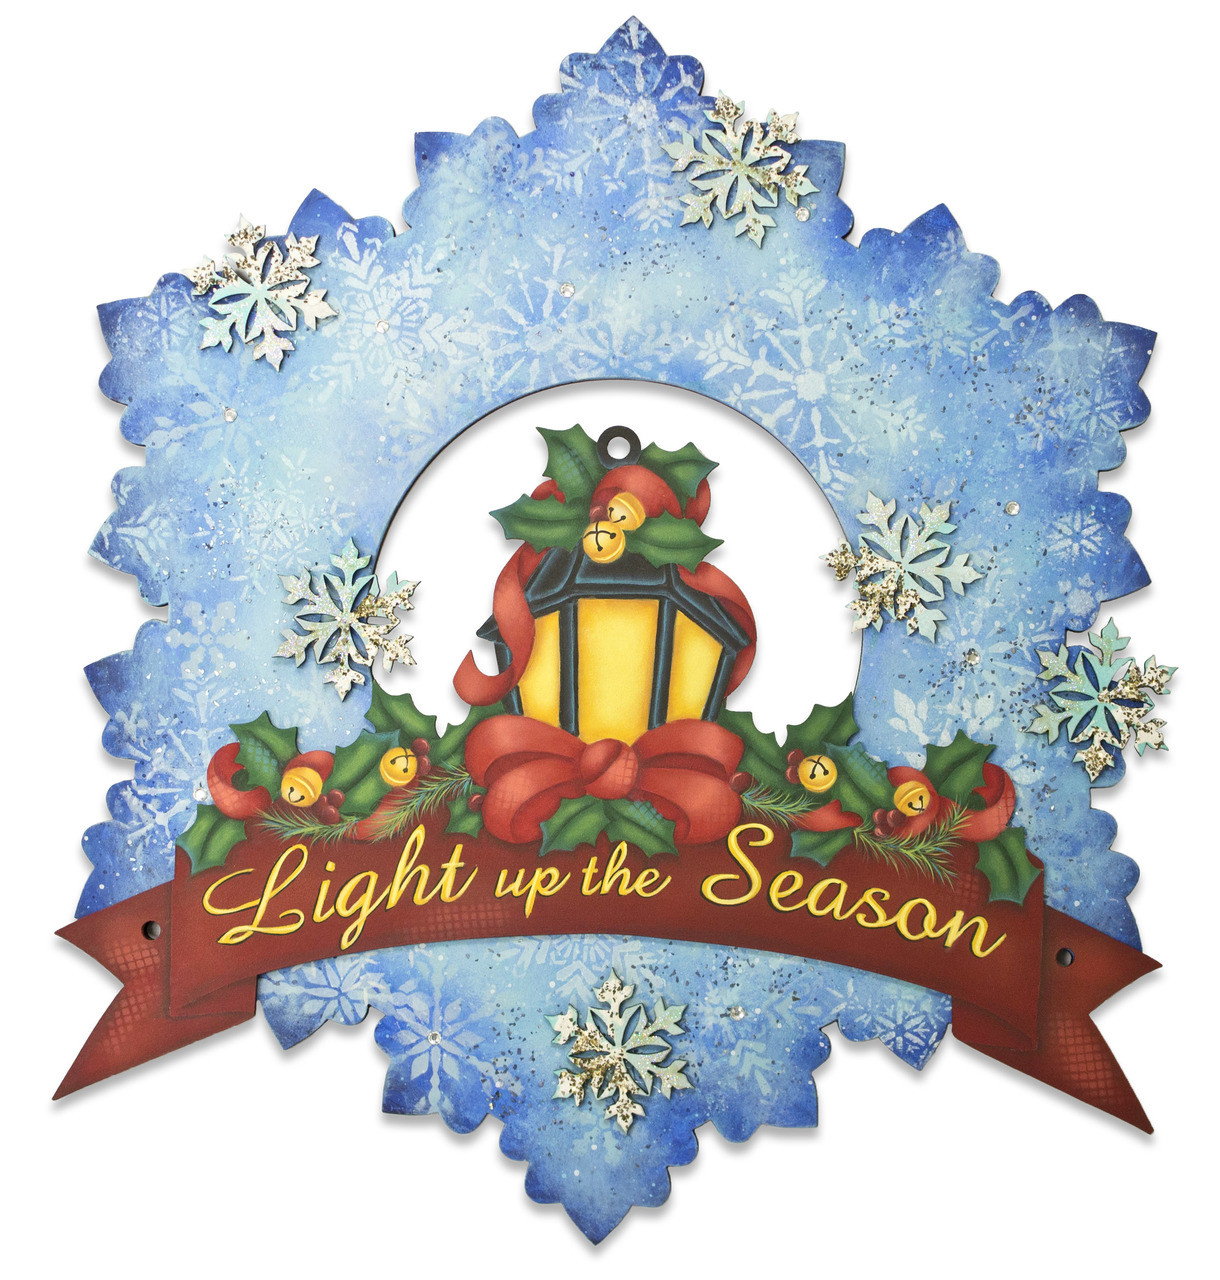 Light Up The Season Wreath - E-Packet - Jeanne Bobish